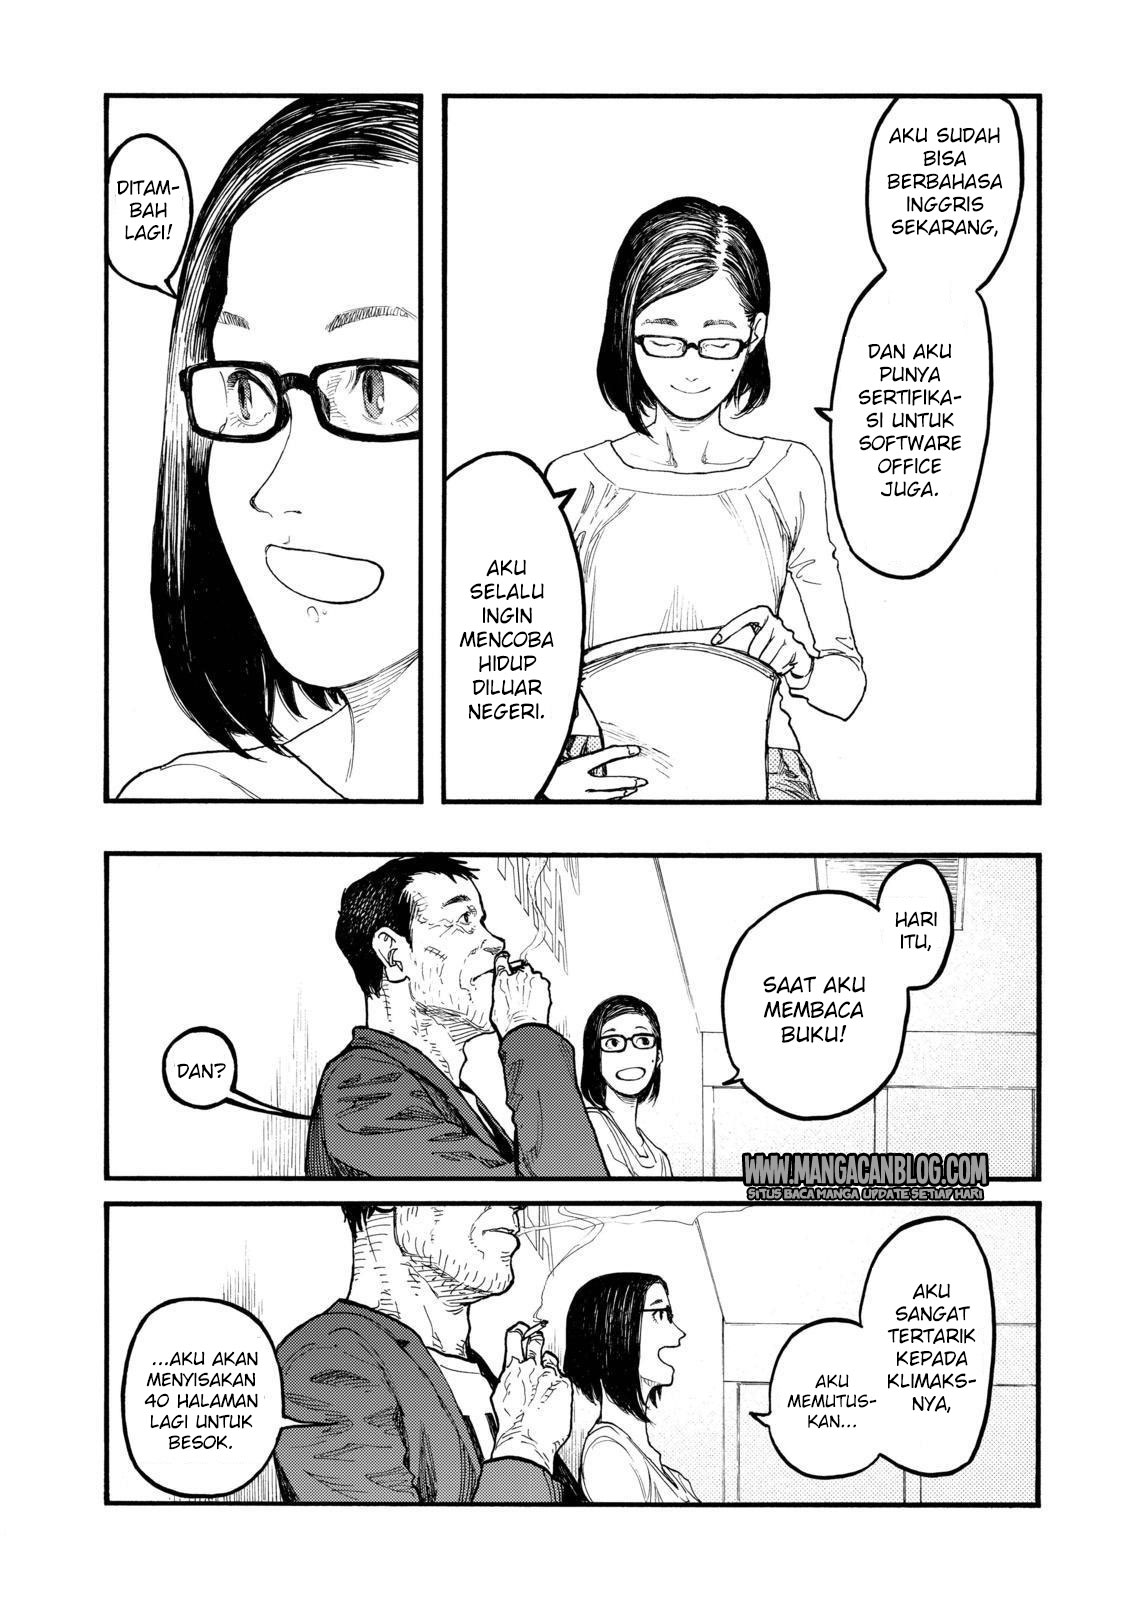 Dilarang COPAS - situs resmi www.mangacanblog.com - Komik ajin 046 - selamat pagi, sampai jumpa besok 47 Indonesia ajin 046 - selamat pagi, sampai jumpa besok Terbaru 31|Baca Manga Komik Indonesia|Mangacan